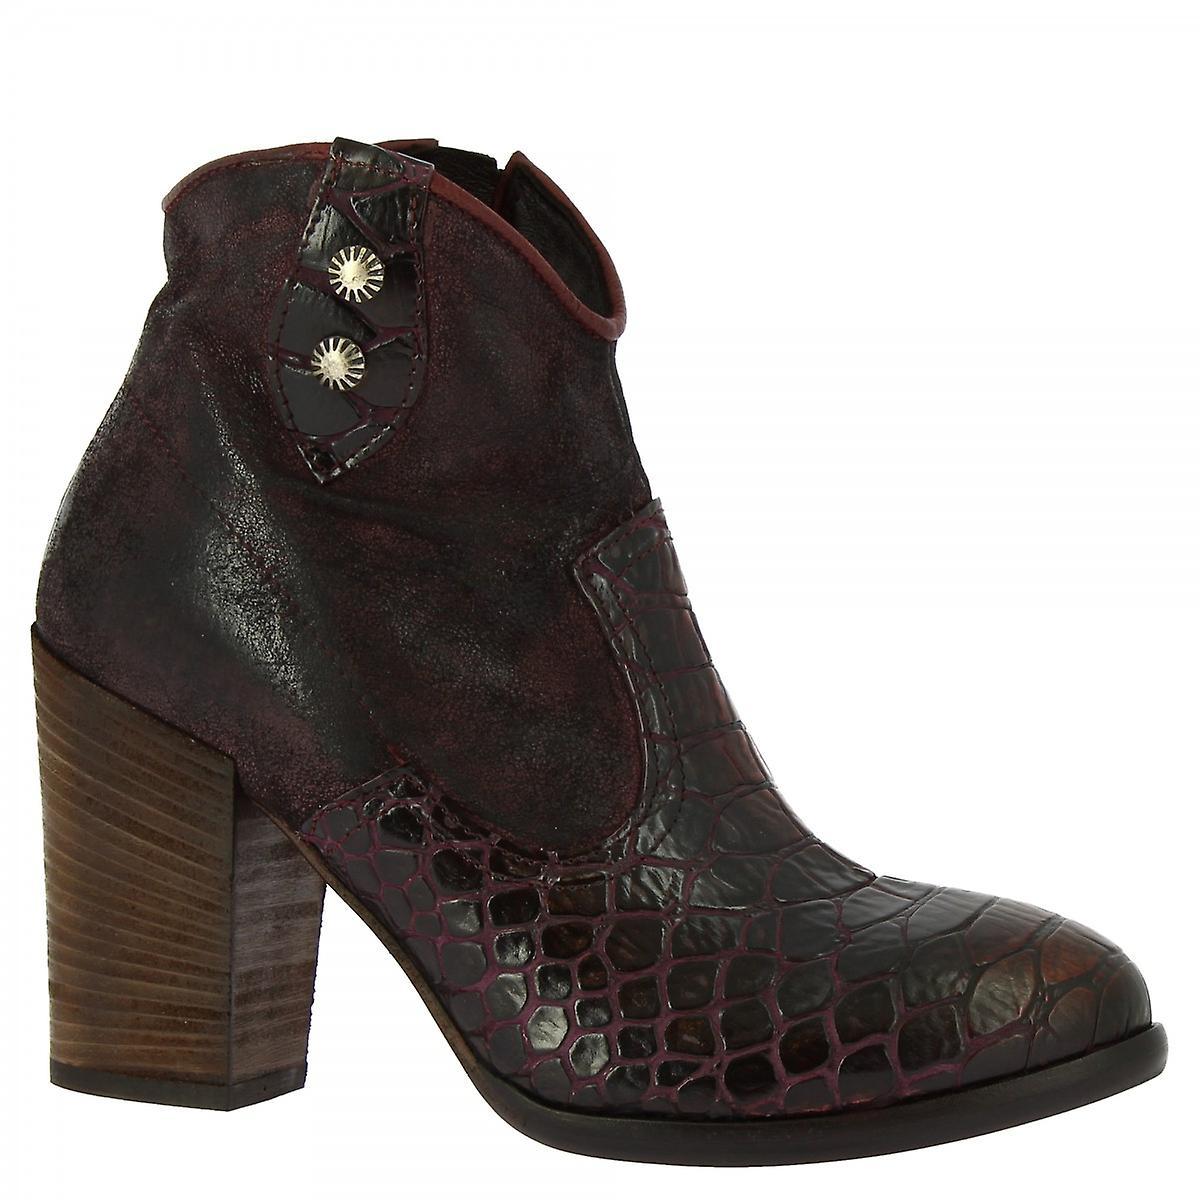 Leonardo Shoes Women's handmade heeled ankle boots burgundy suede leather python khJhf